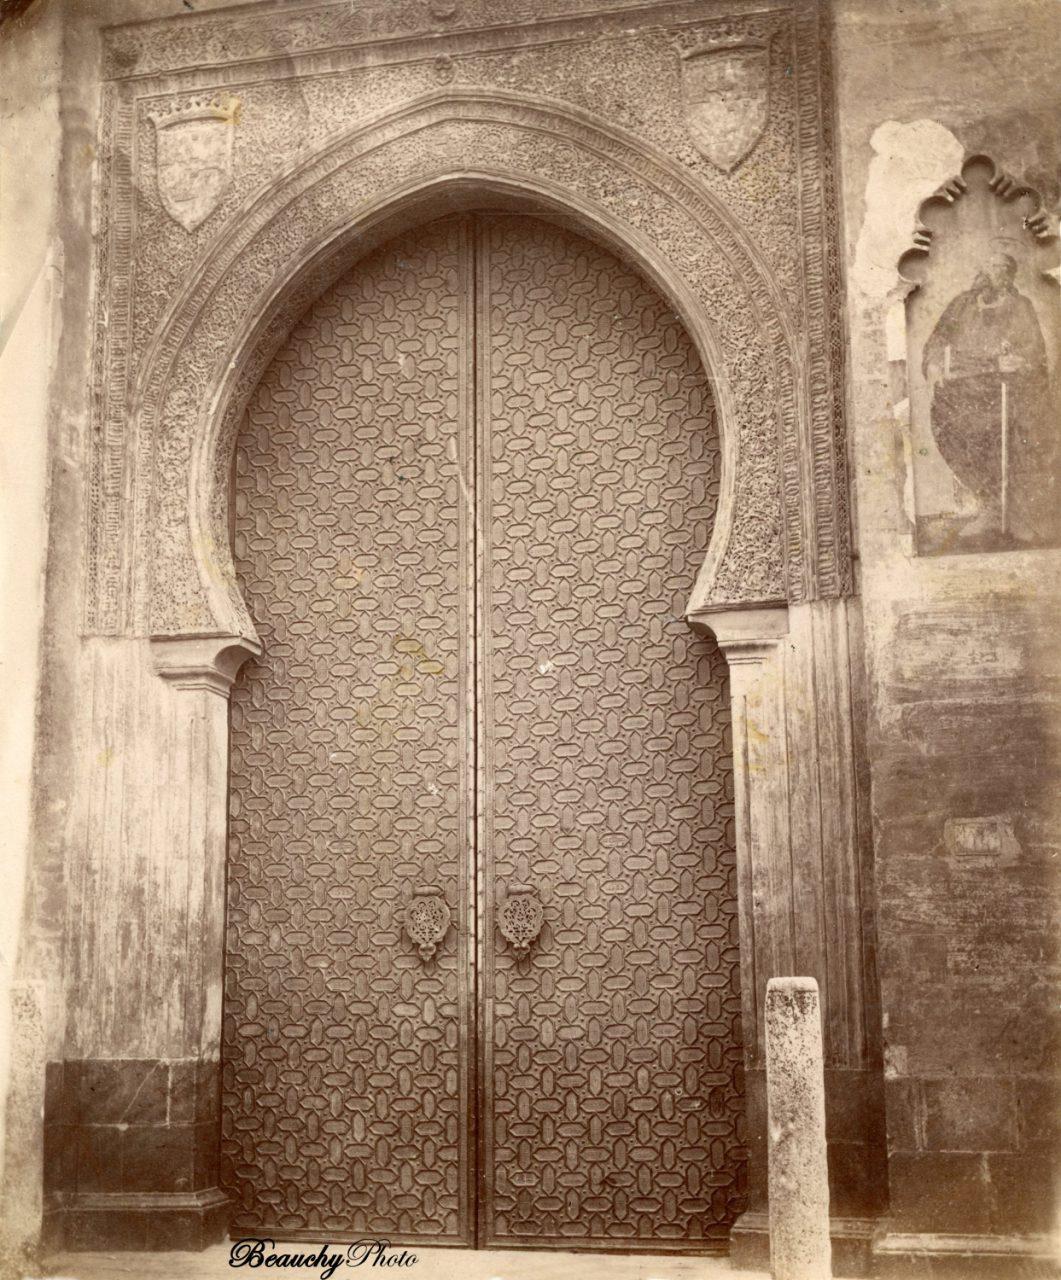 Puerta del Alcazar de Sevilla